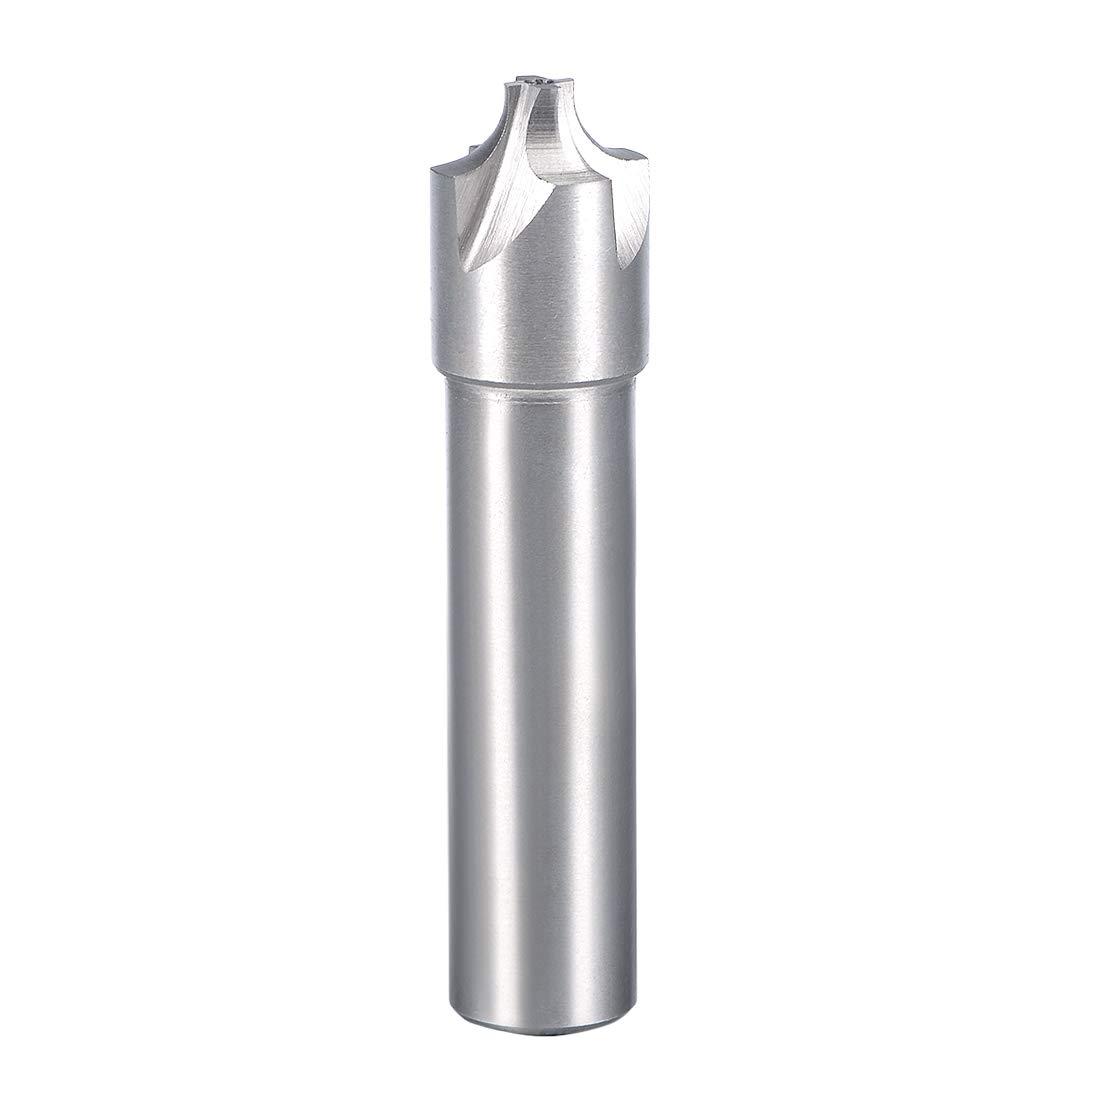 4.2 x 7.4mm sourcingmap HSSAL Cobalt Counterbore End Mill Cap Screws Expand Holes 4 Flutes